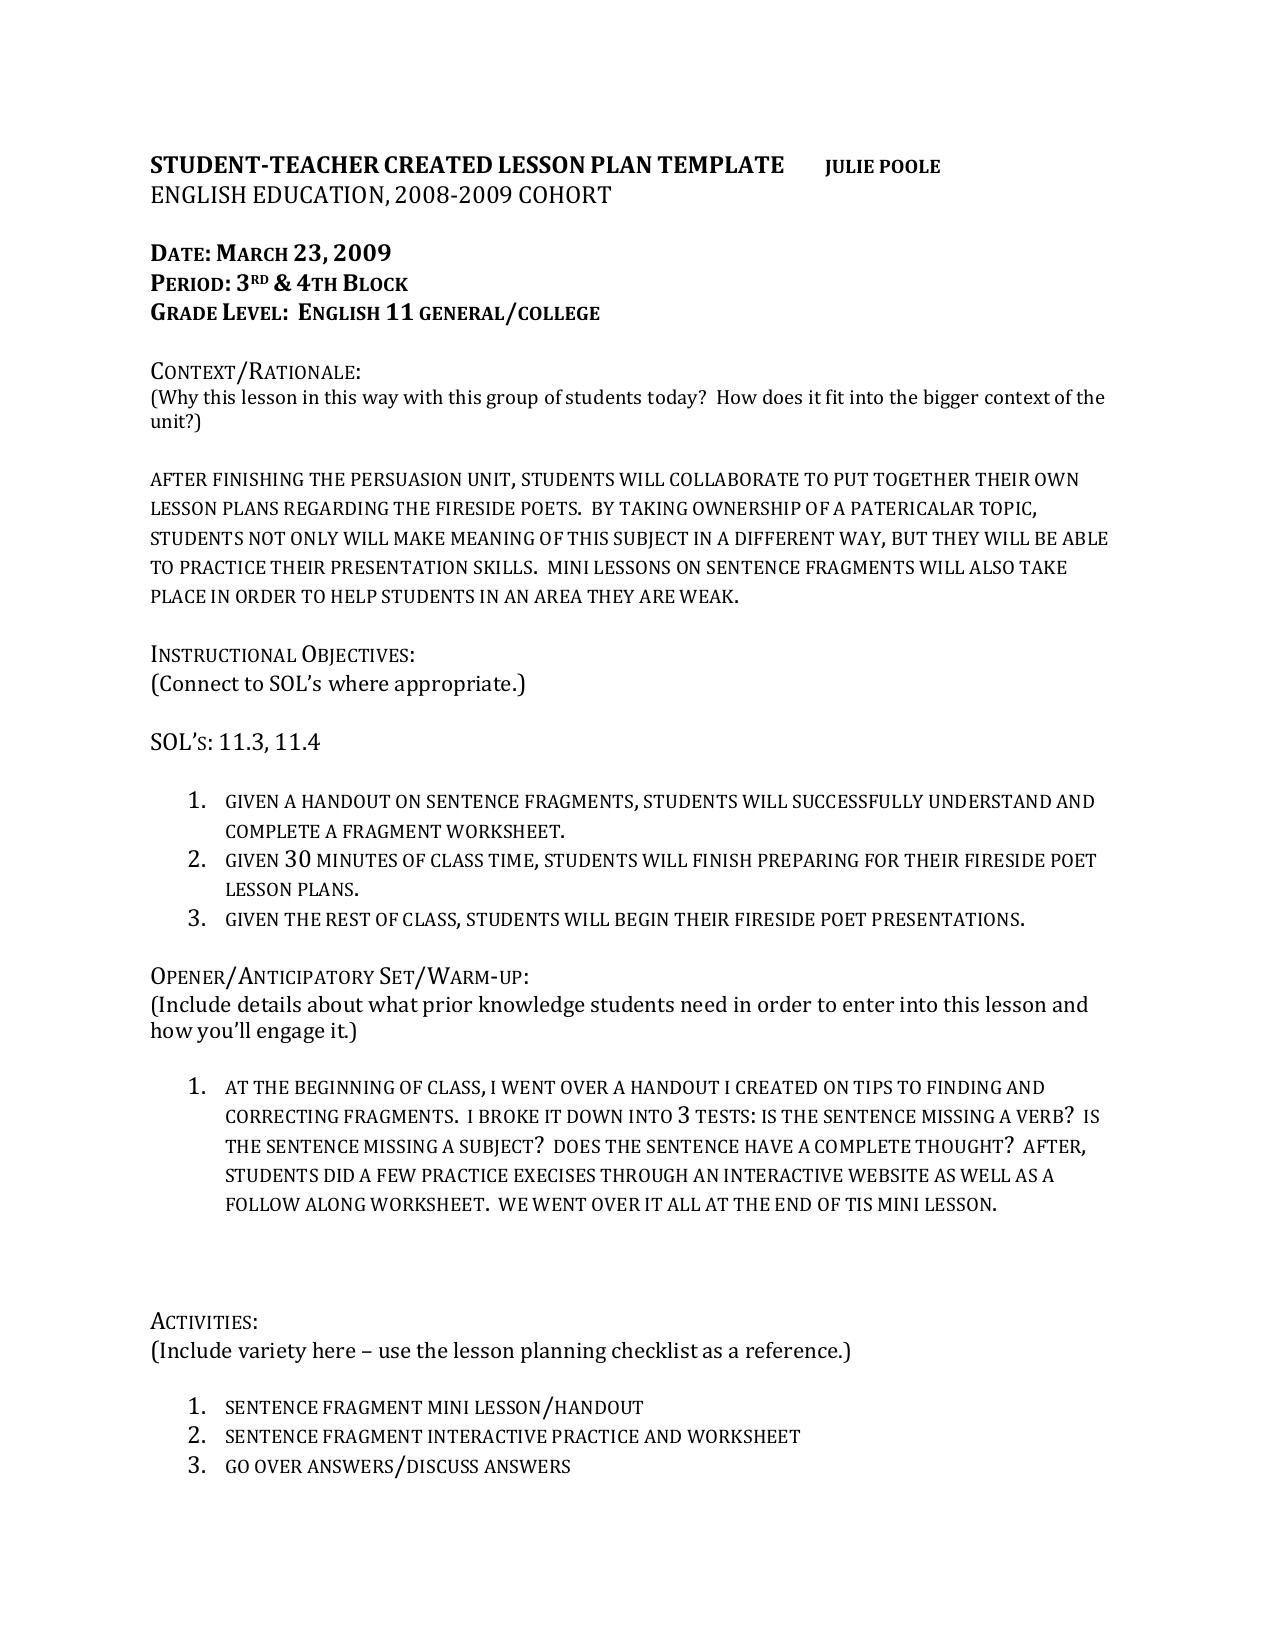 Sentence Fragments Worksheet Answers